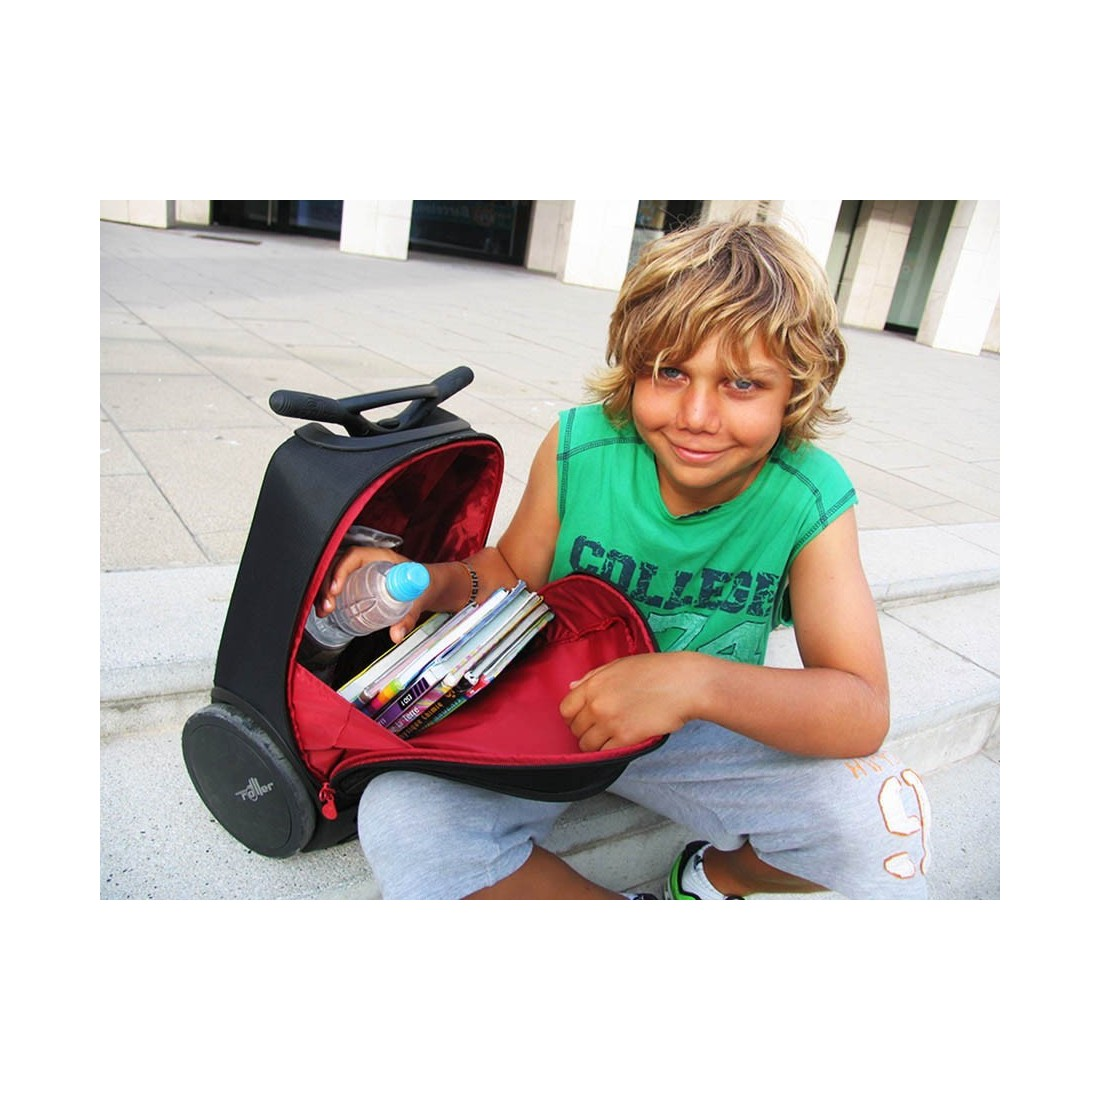 Plecak na kołkach bez szelek Roller XL Mandala dla dziewczyny - plecak-tornister.pl